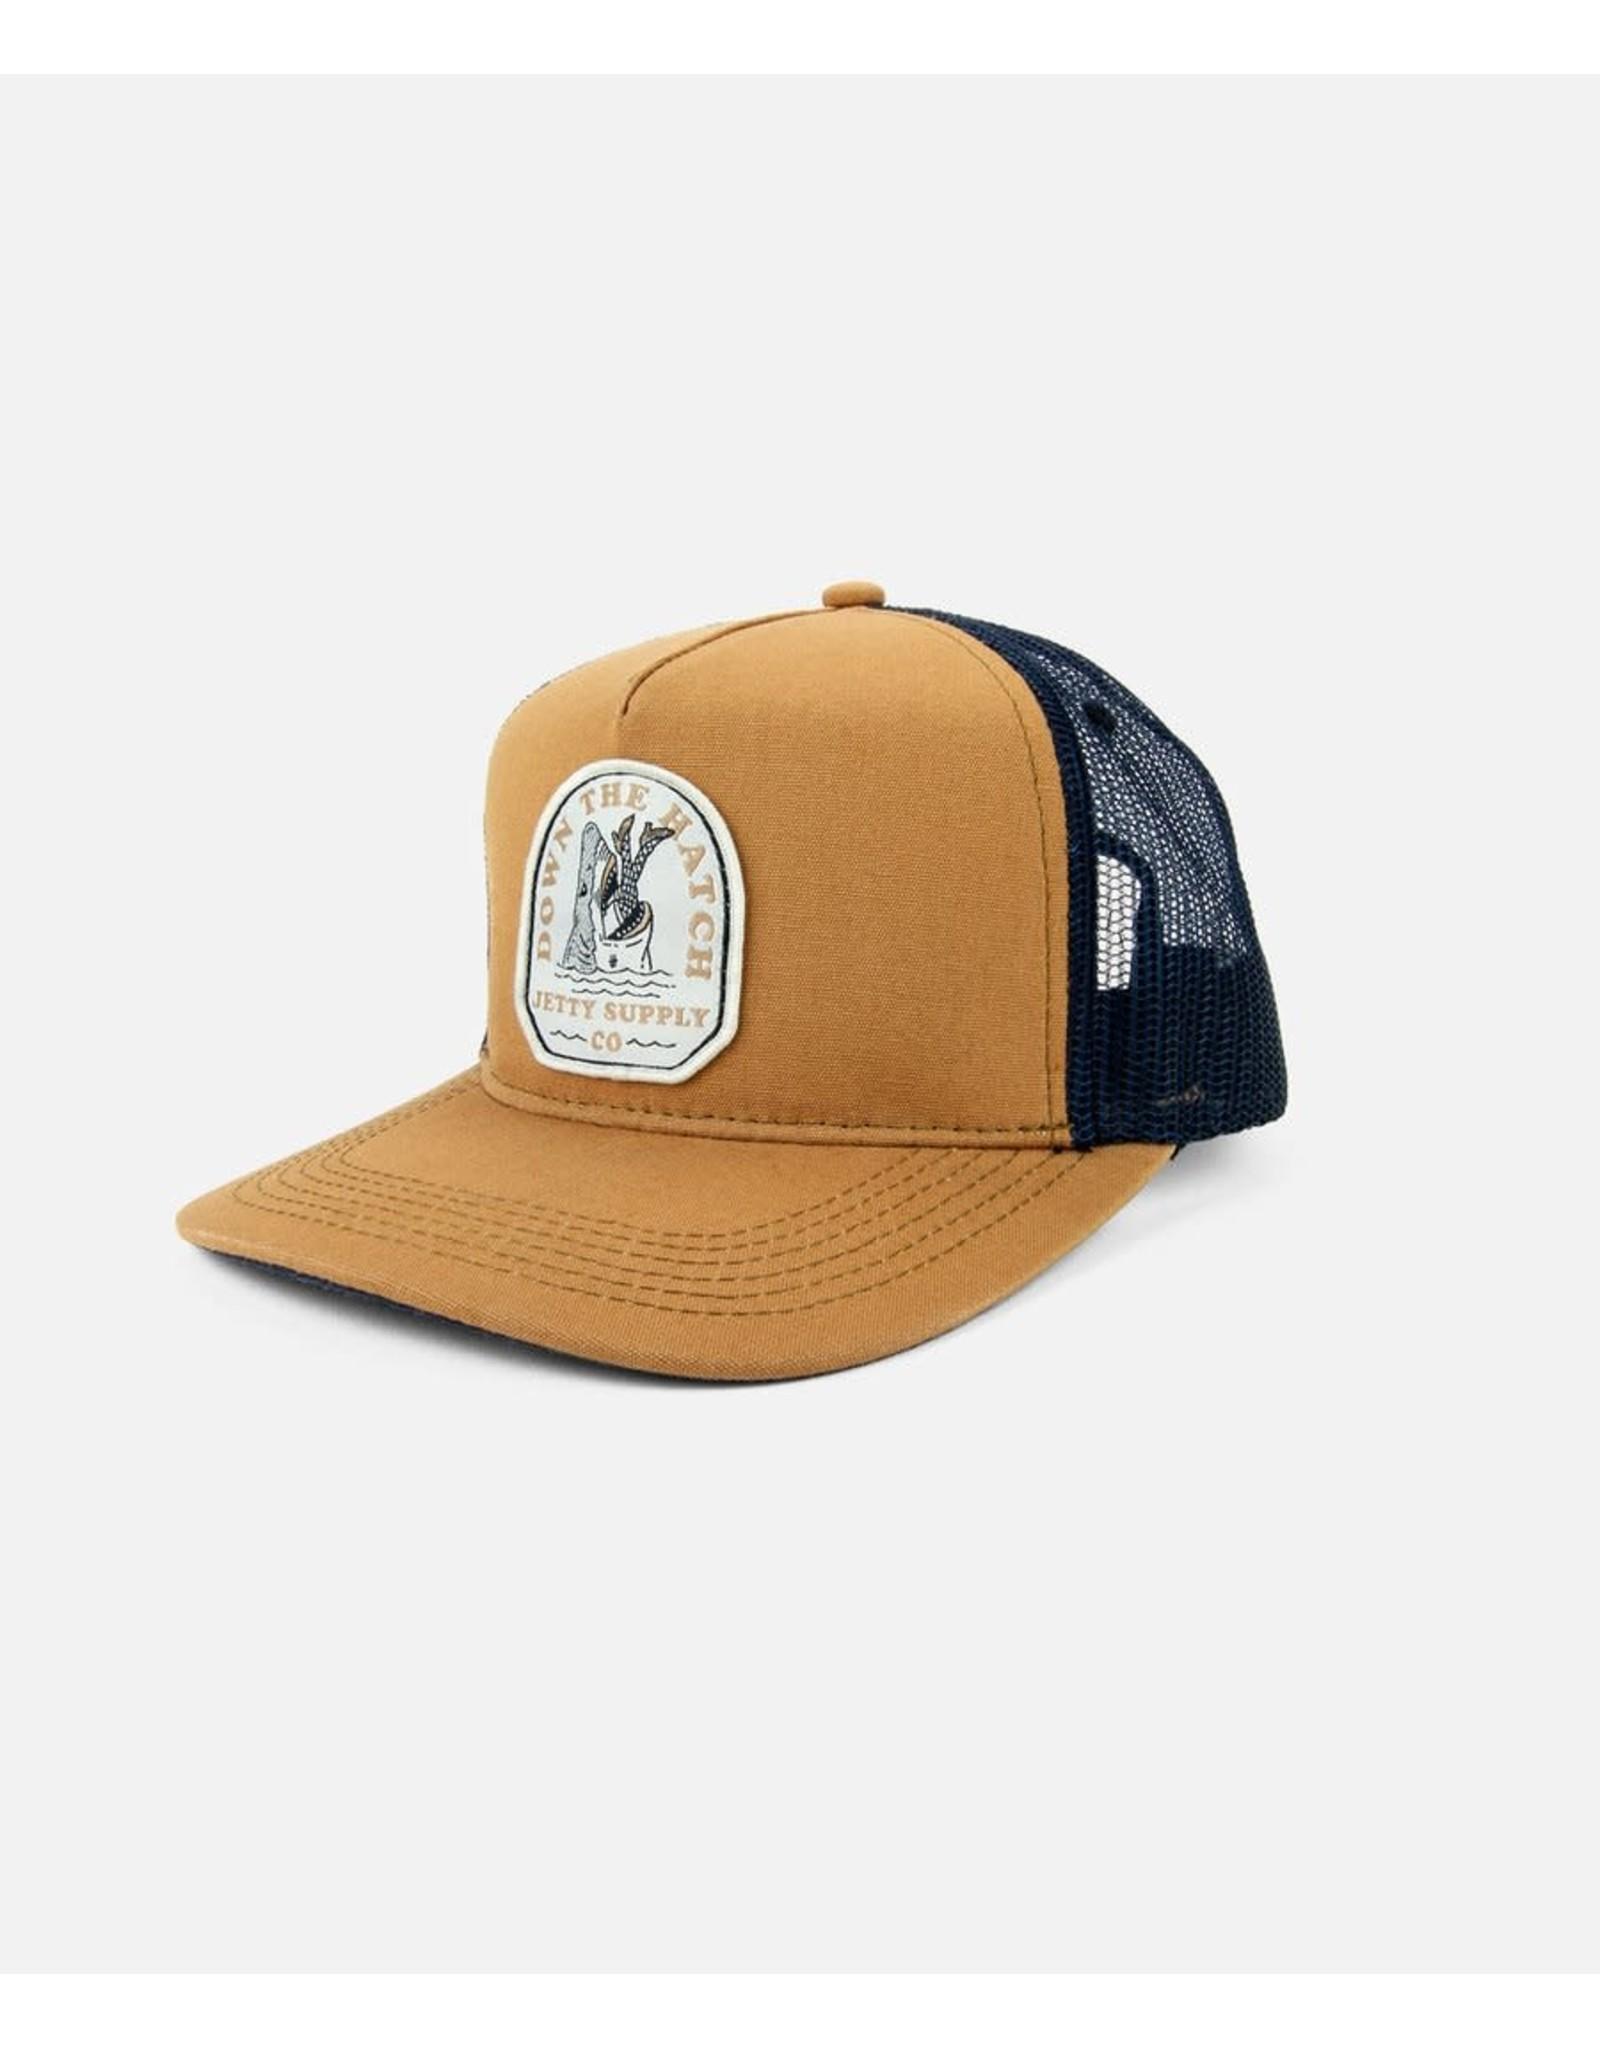 Jetty Hatch Classic Trucker Hat